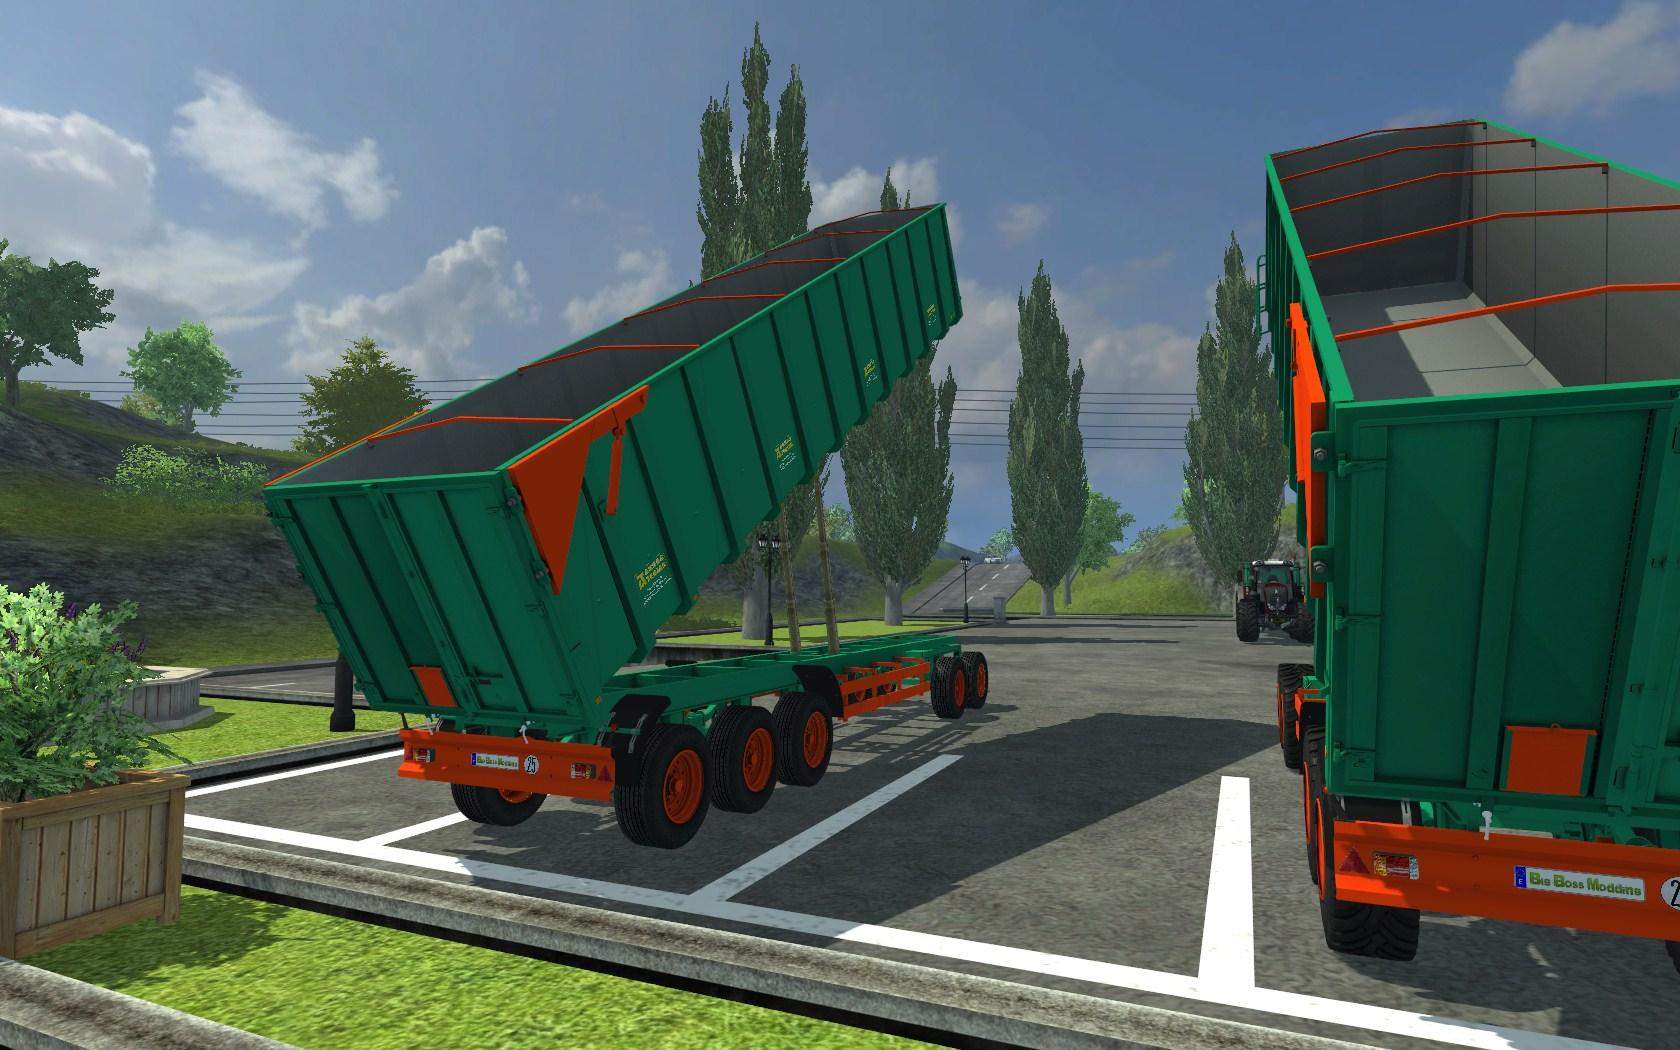 [Encuesta][T.E.P.] Proyecto Aguas Tenias (22 modelos + 1 Camión) [Terminado 21-4-2014]. - Página 3 Fsscreen_2014_01_02_2mwsyk